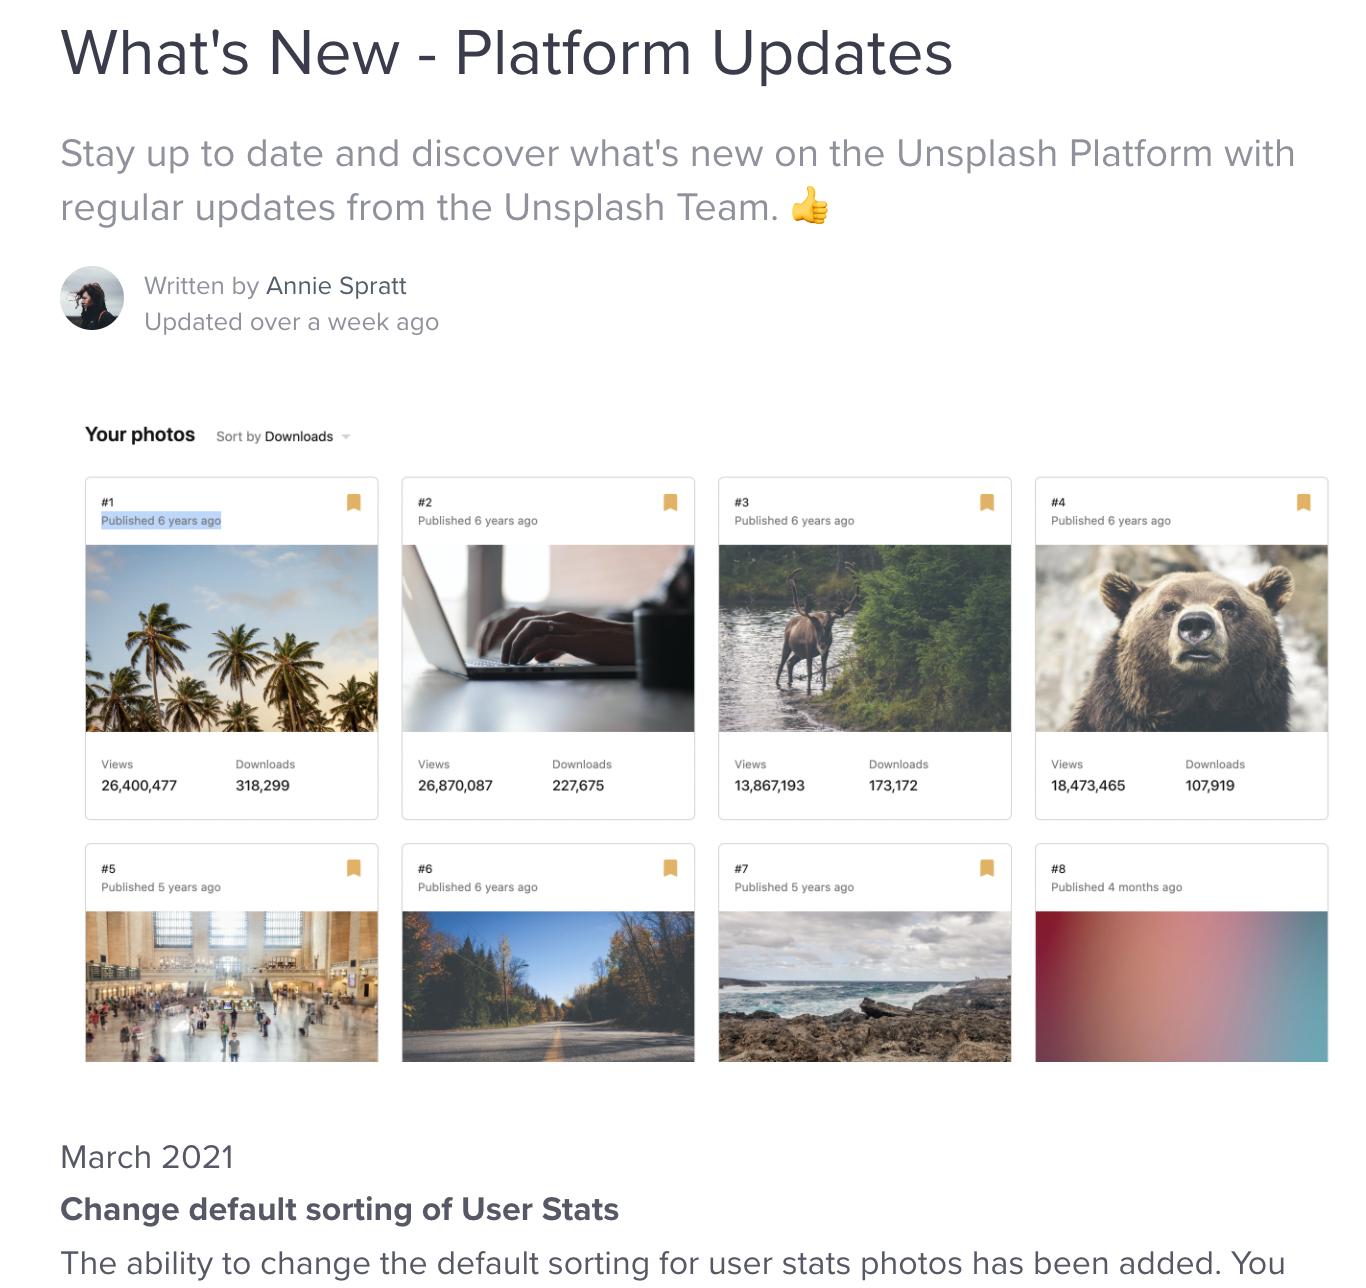 Unsplash Product Updates